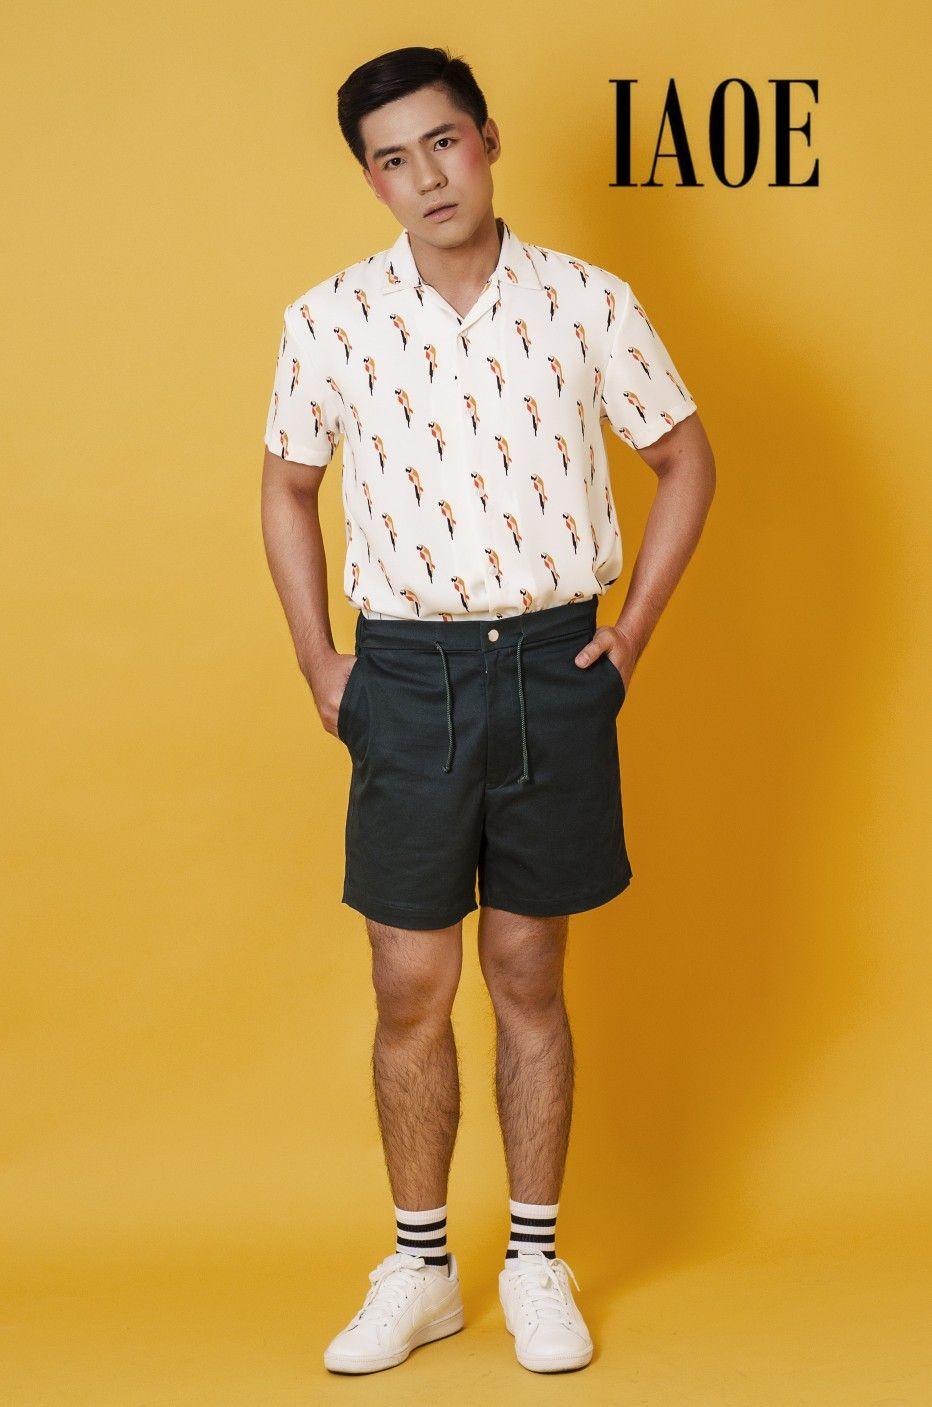 498c82e19a64 IAOE Summer Polo  IAOE  LEVI  Summer  Men  Fashion  Menswear  Buttondown   Brand  Clothing  MenStyle  Style